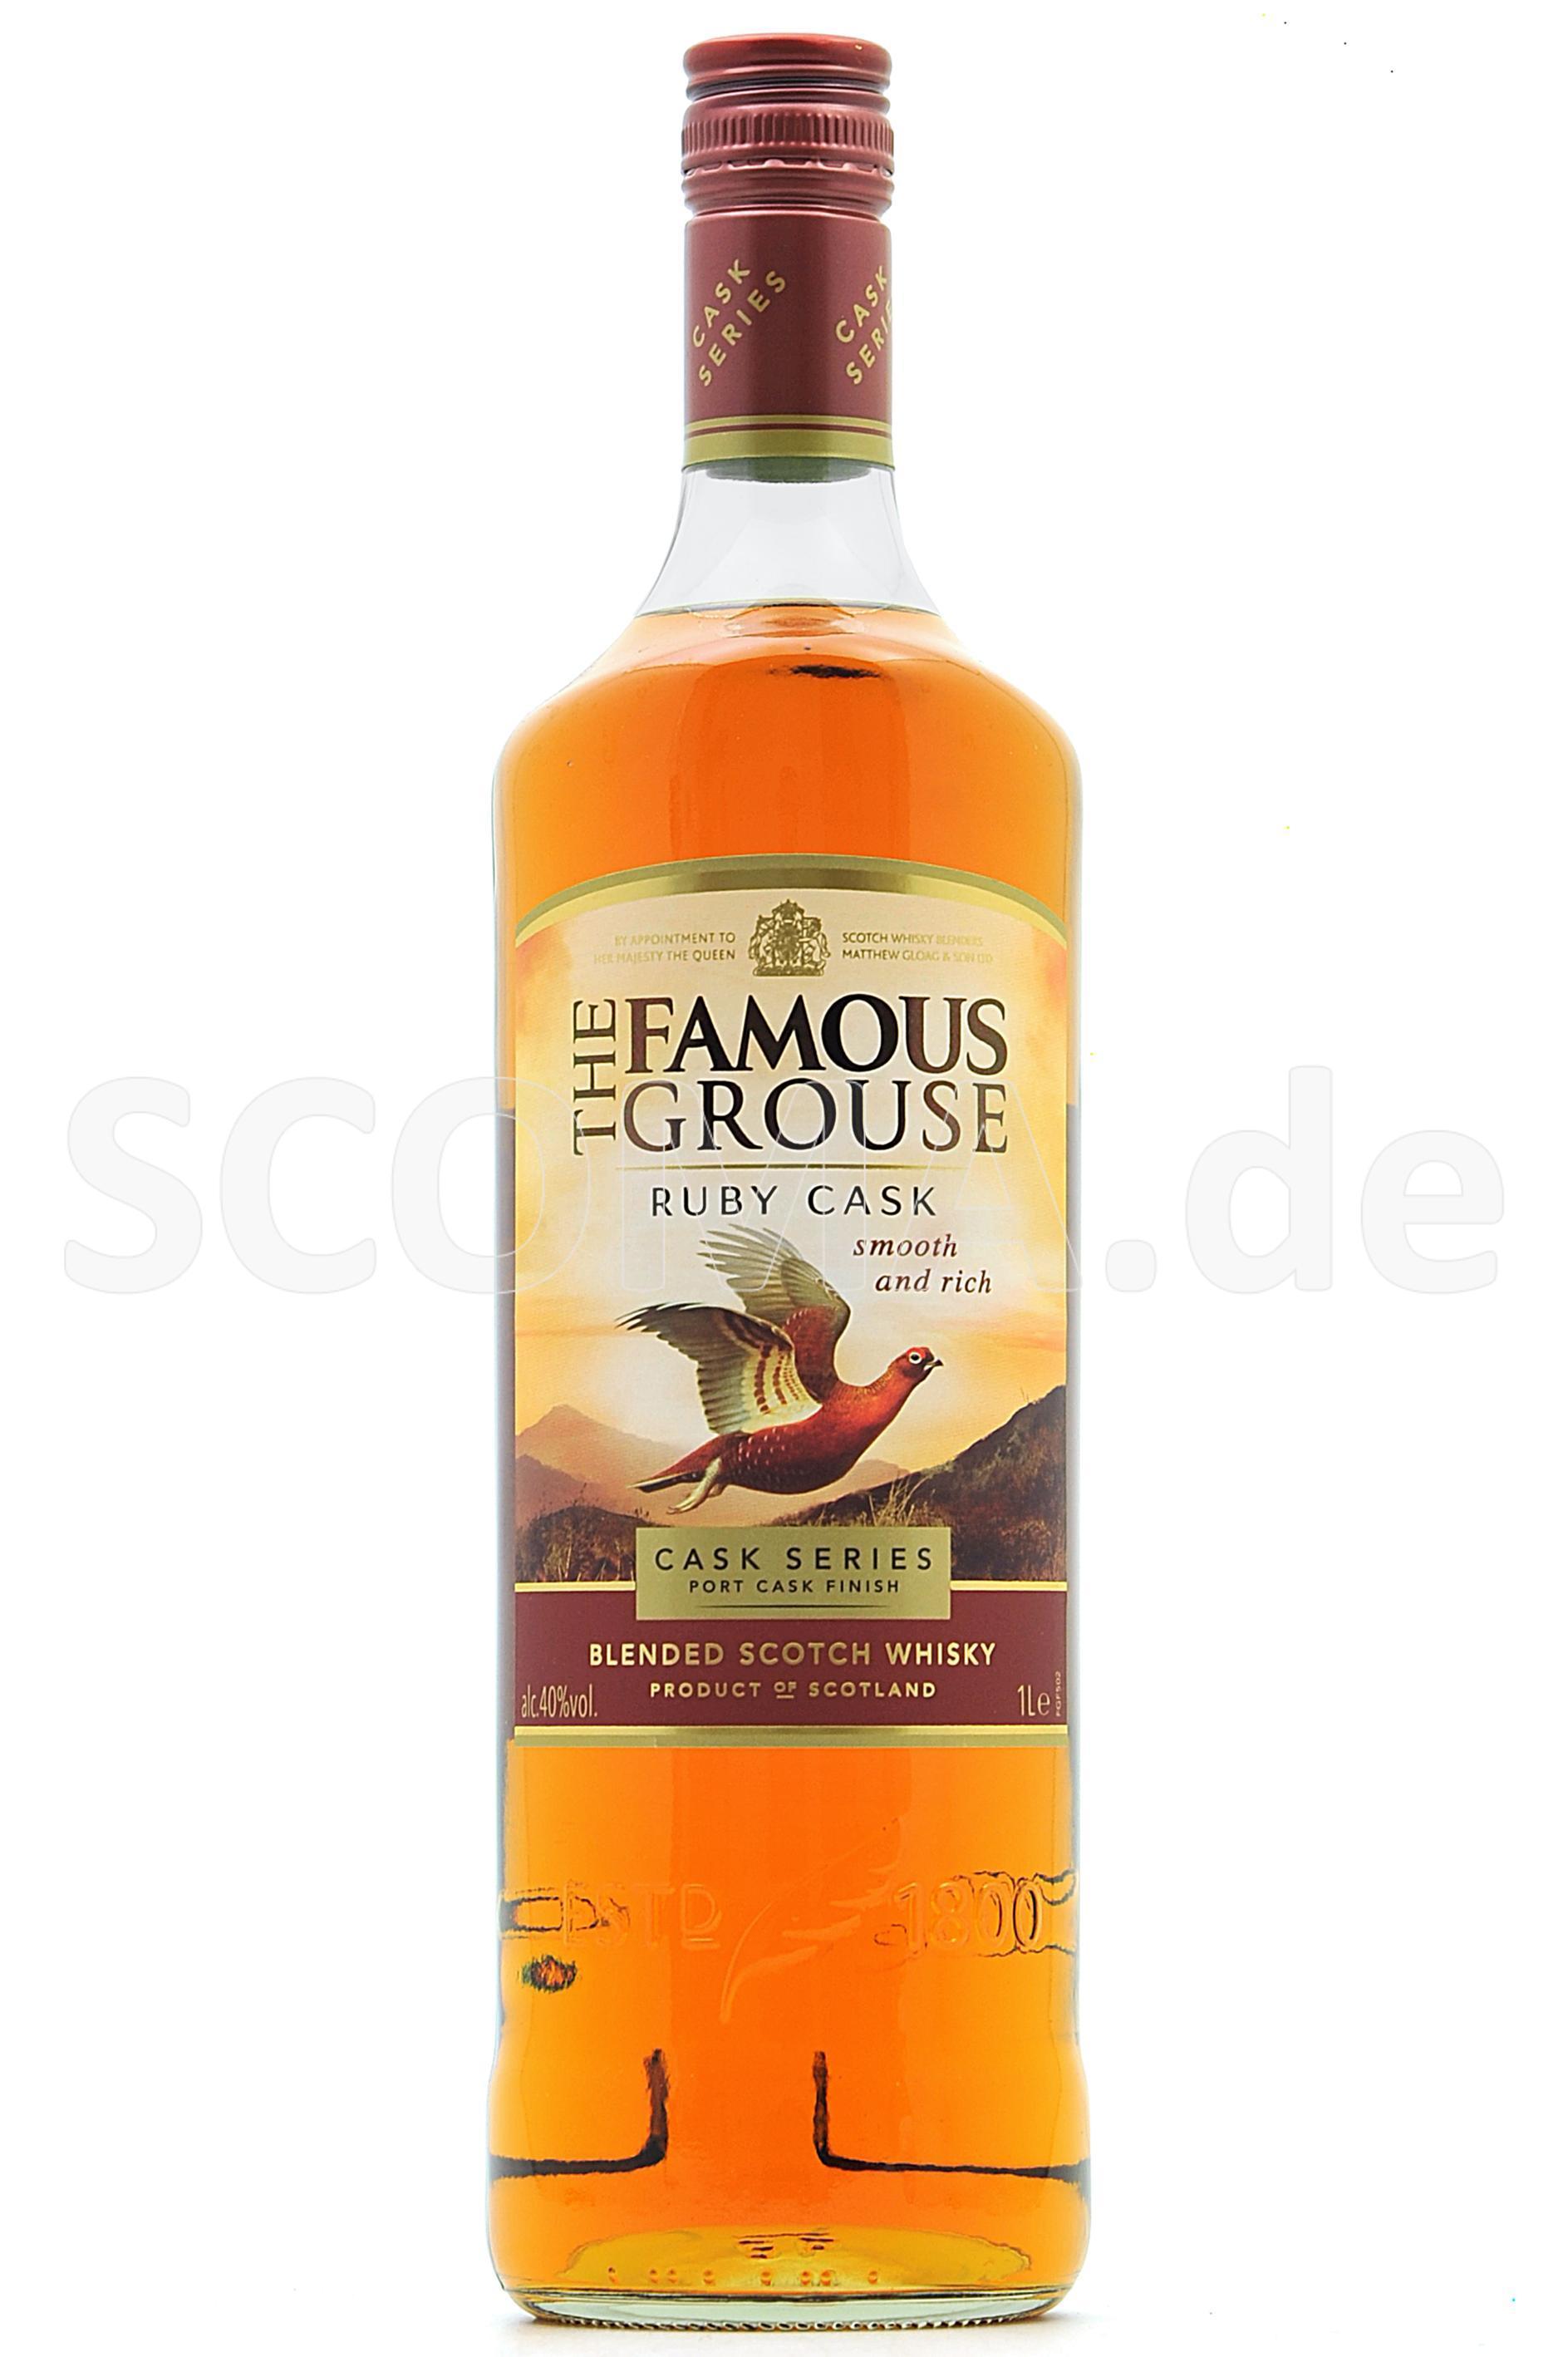 Famous Grouse Cask Series - Ru...